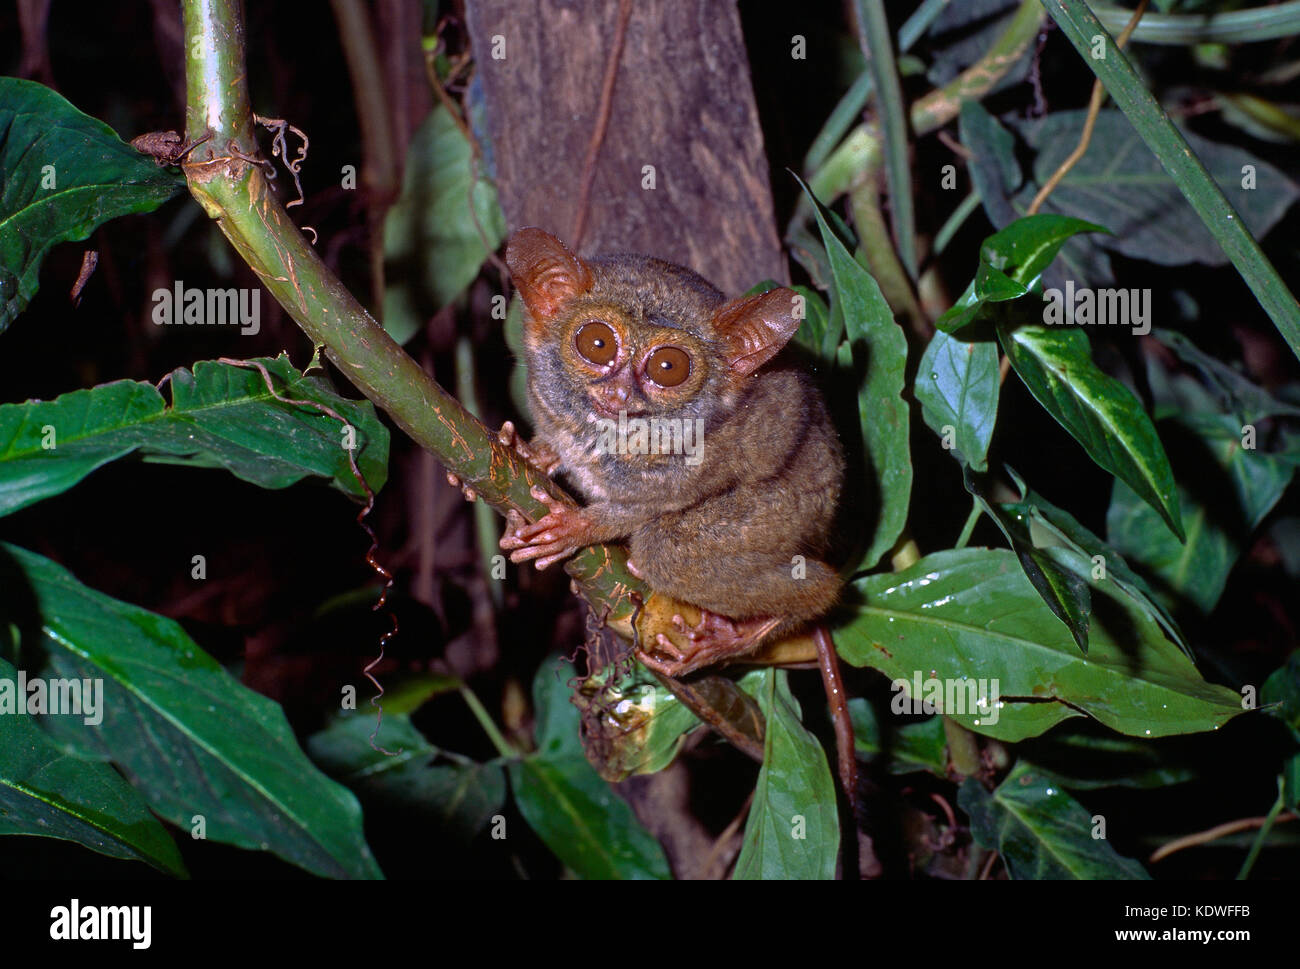 Indonesia. Sulawesi. Wildlife. Eastern Tarsier. - Stock Image